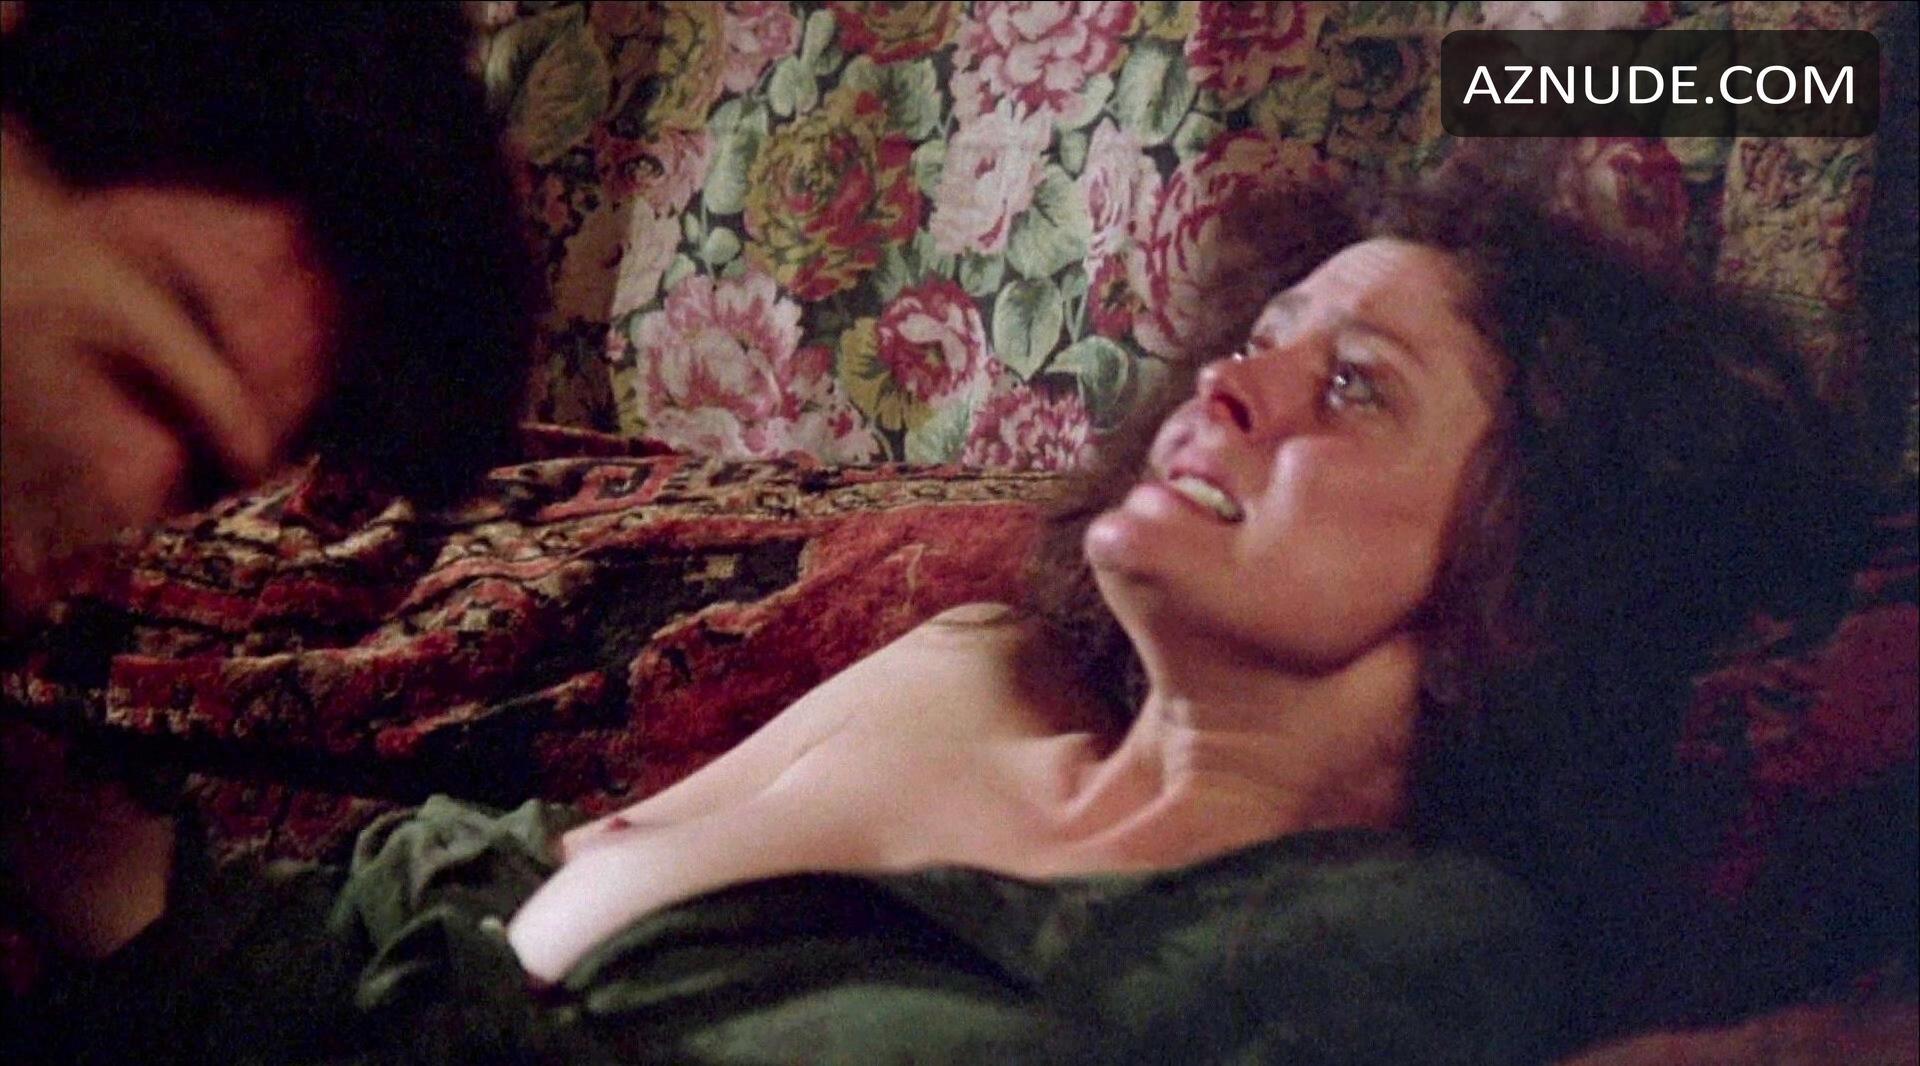 King Of The Gypsies Nude Scenes - Aznude-8590